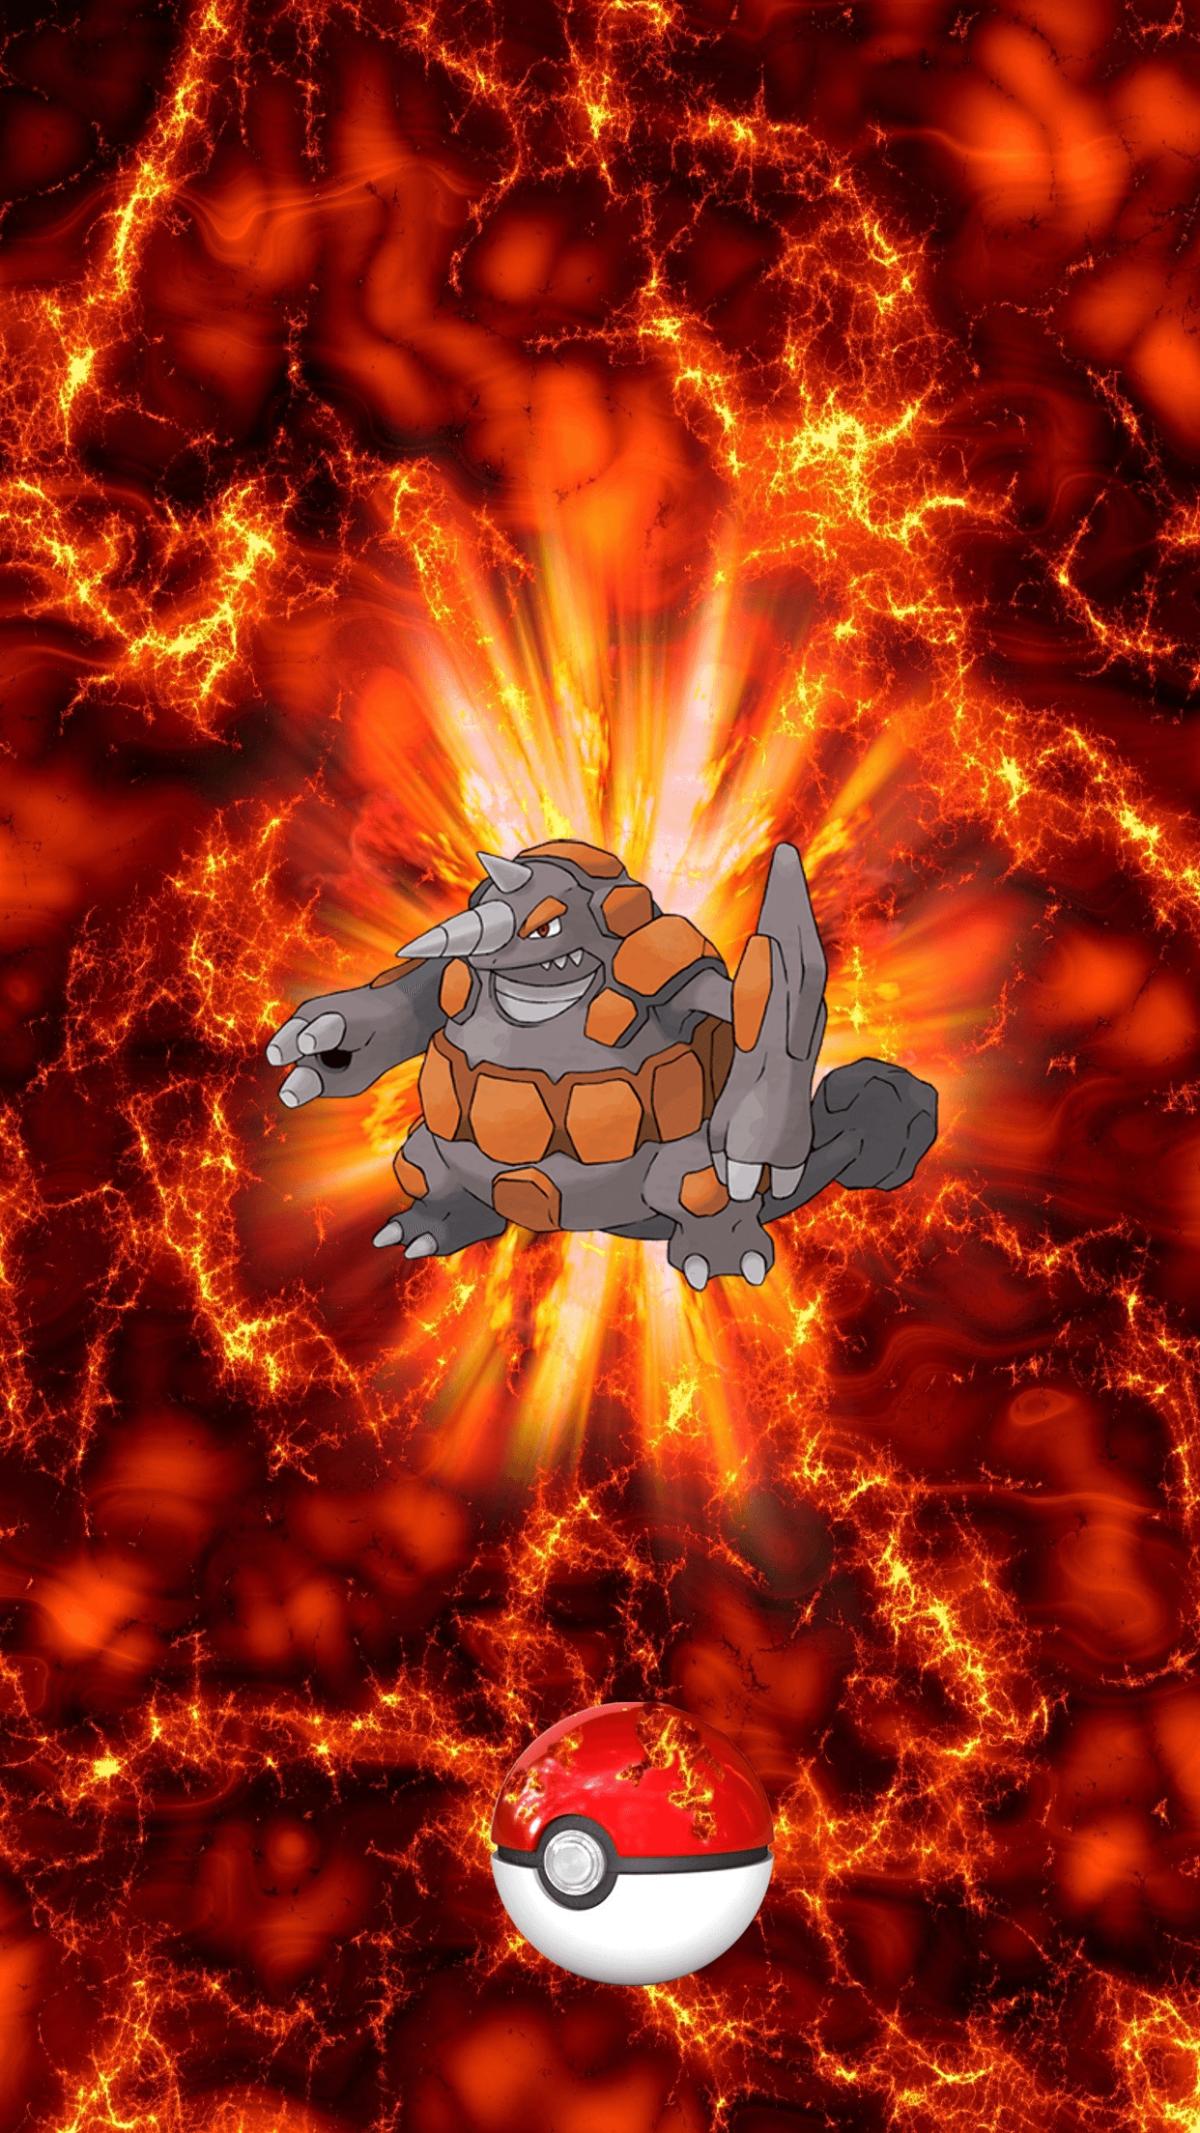 464 Fire Pokeball Rhyperior Dosidon 36 Rhydon | Wallpaper